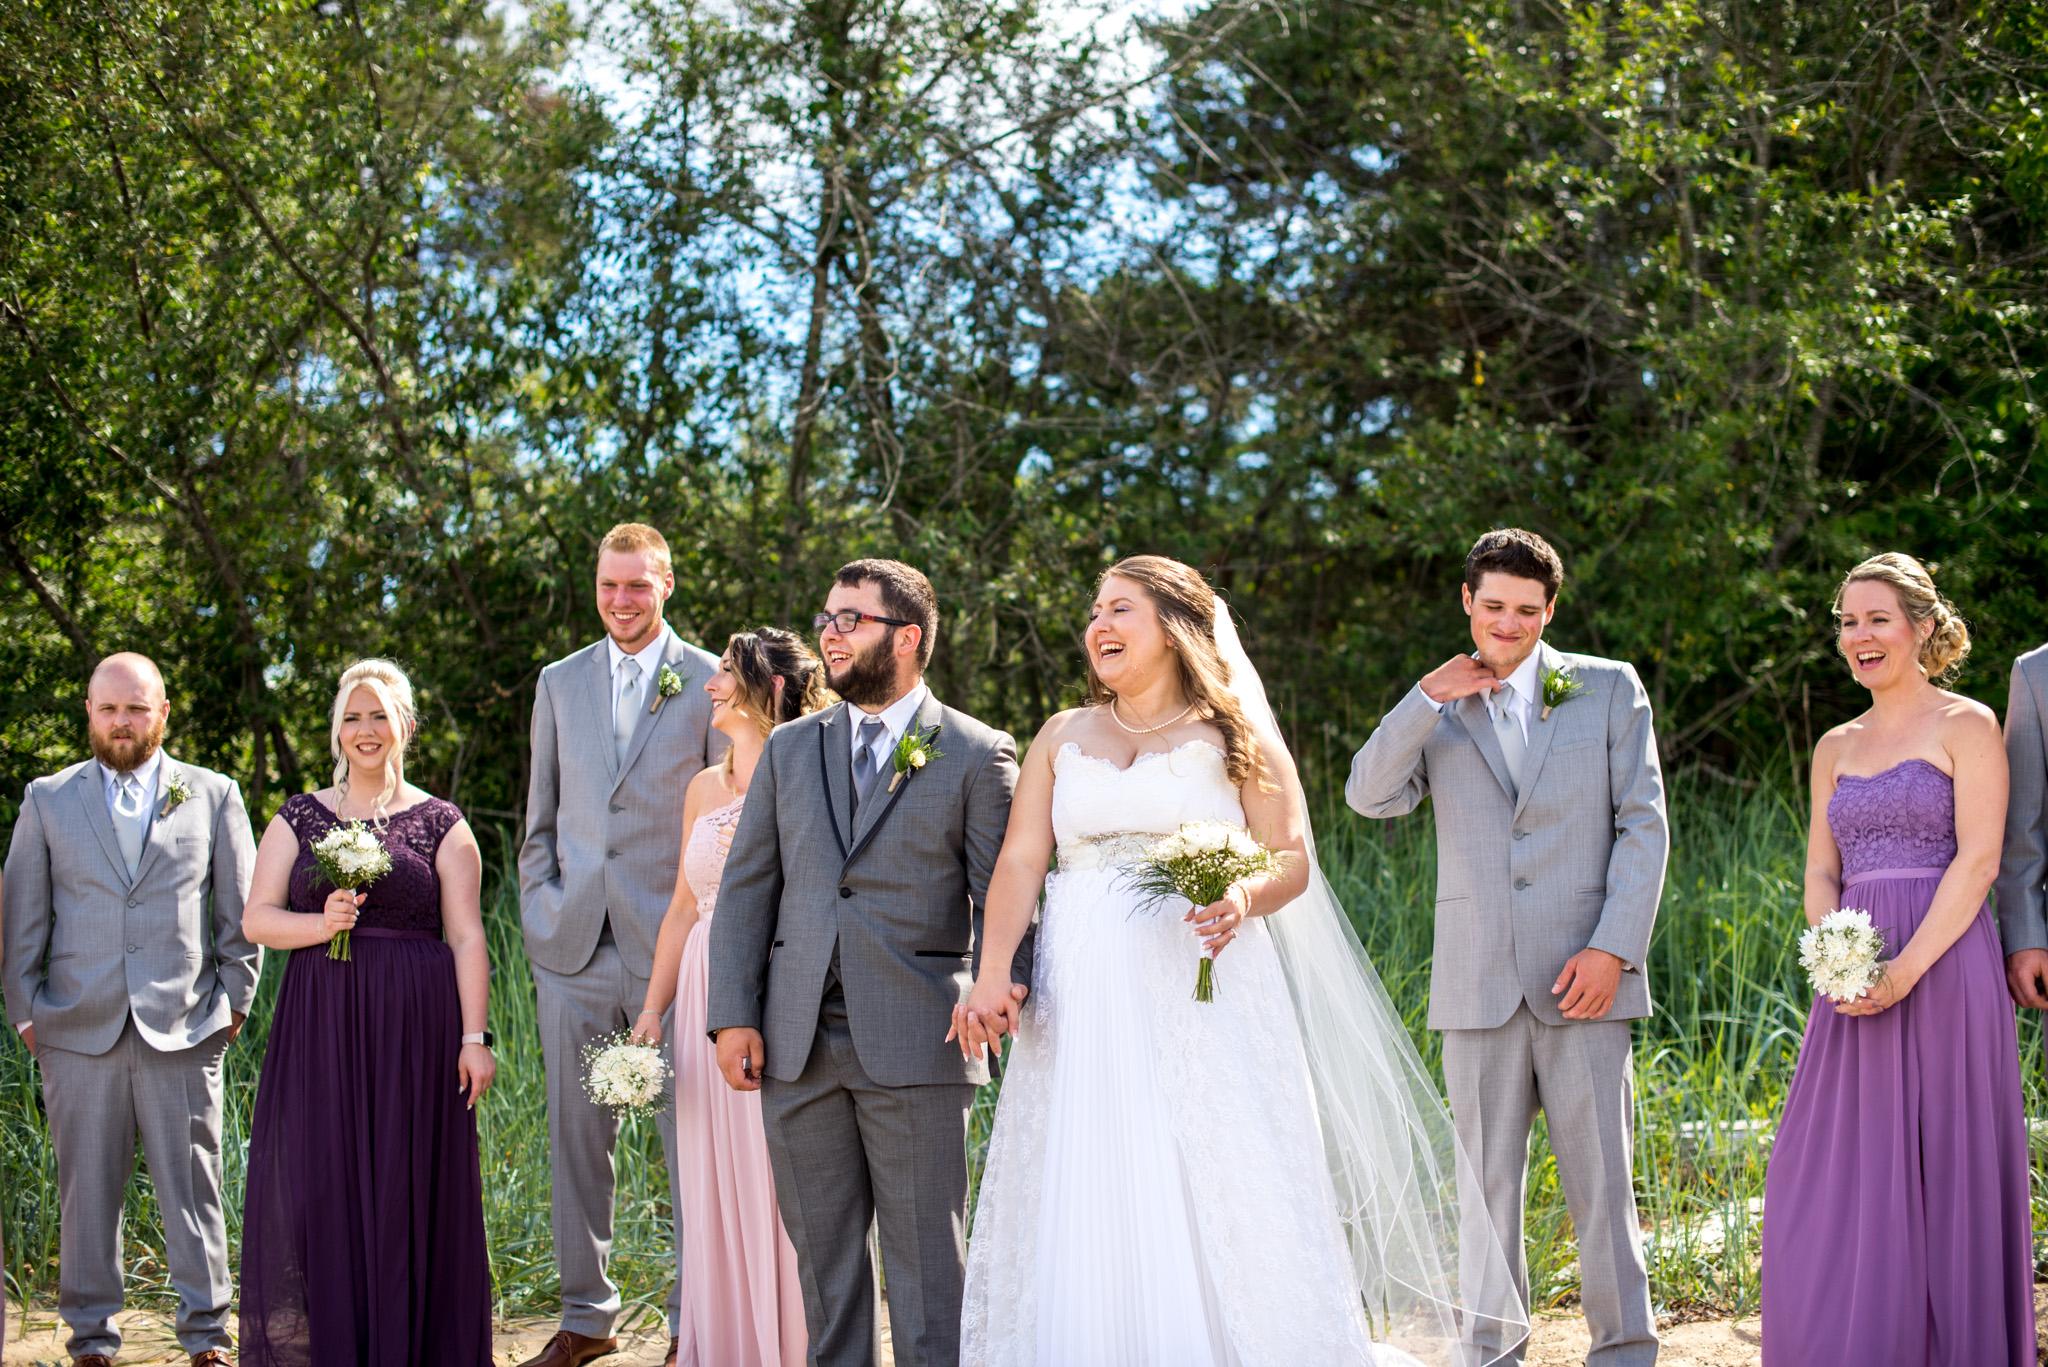 Powell River Wedding Photographer-108.JPG